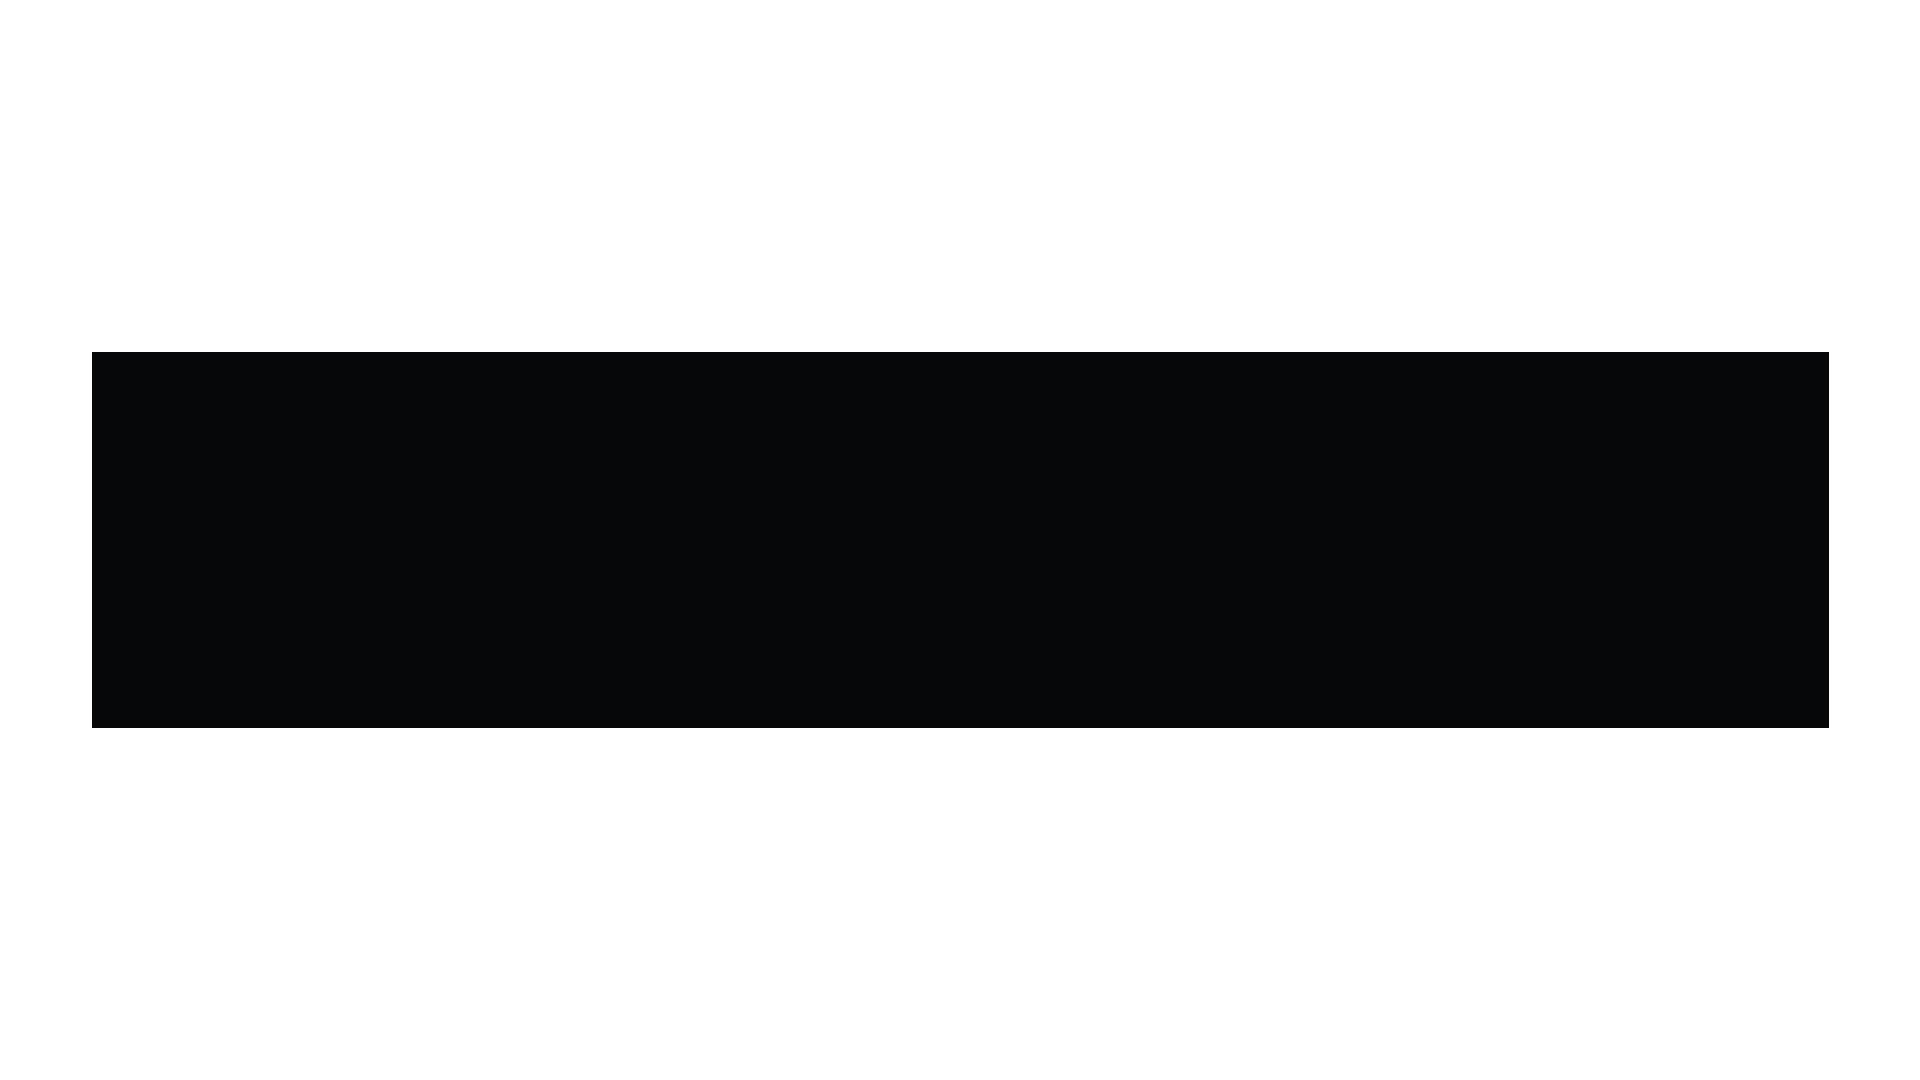 KLEAN_RADIO_MAIN